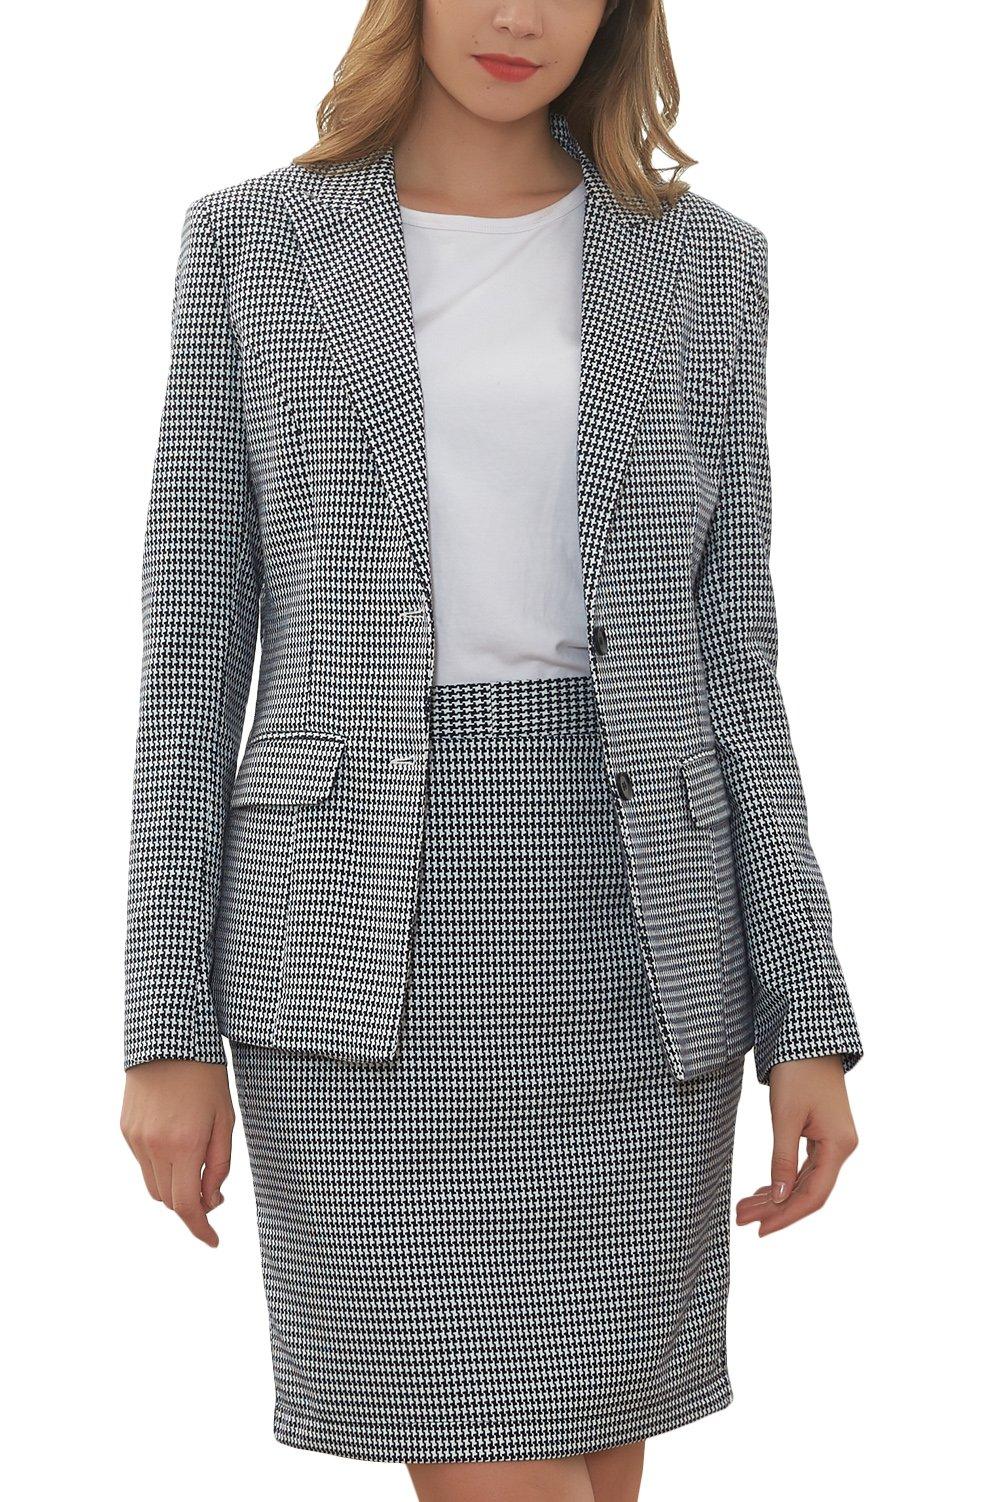 Hanayome Women's Suit Sets Slim Fit Two Pieces Casual Blazer Separate Short Dress MI2 (Grey, 16W) by Hanayome